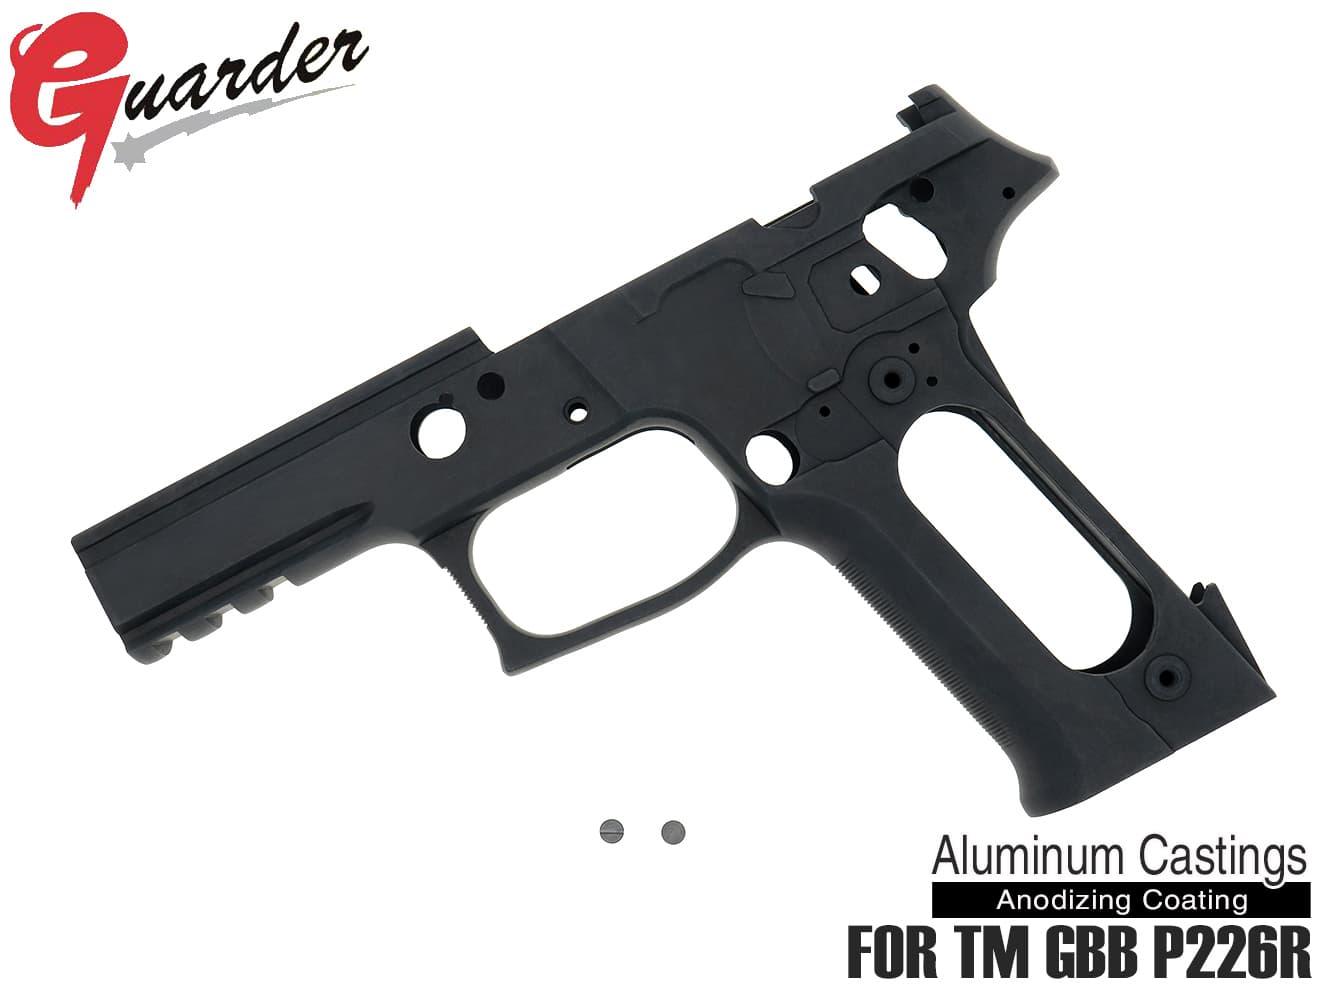 P226 P226-60(B)■GUARDER BK RAIL シグ フレームKIT Rail対応 No P226 for GBB 刻印無し アルミフレーム Marking ザウエル マルイ P226R◆東京マルイ